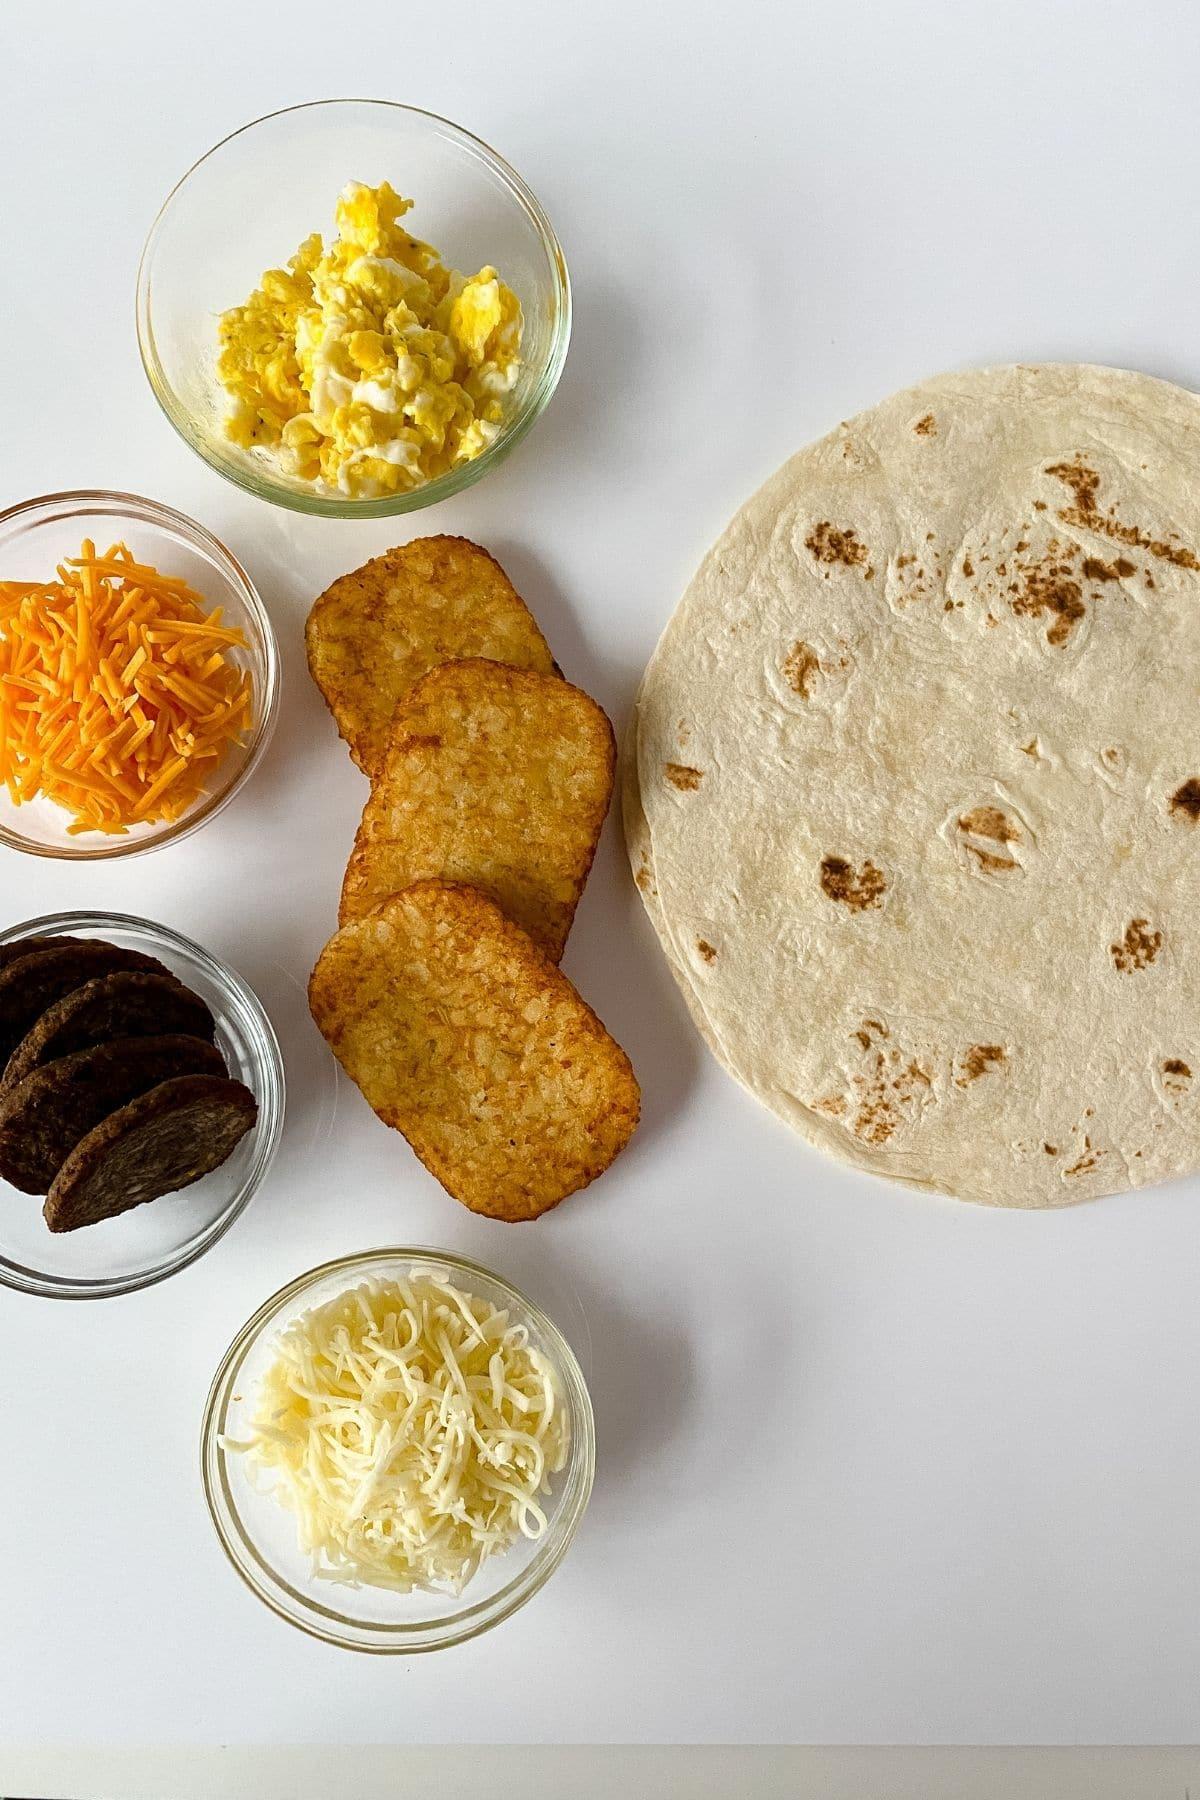 Ingredients for breakfast wrap